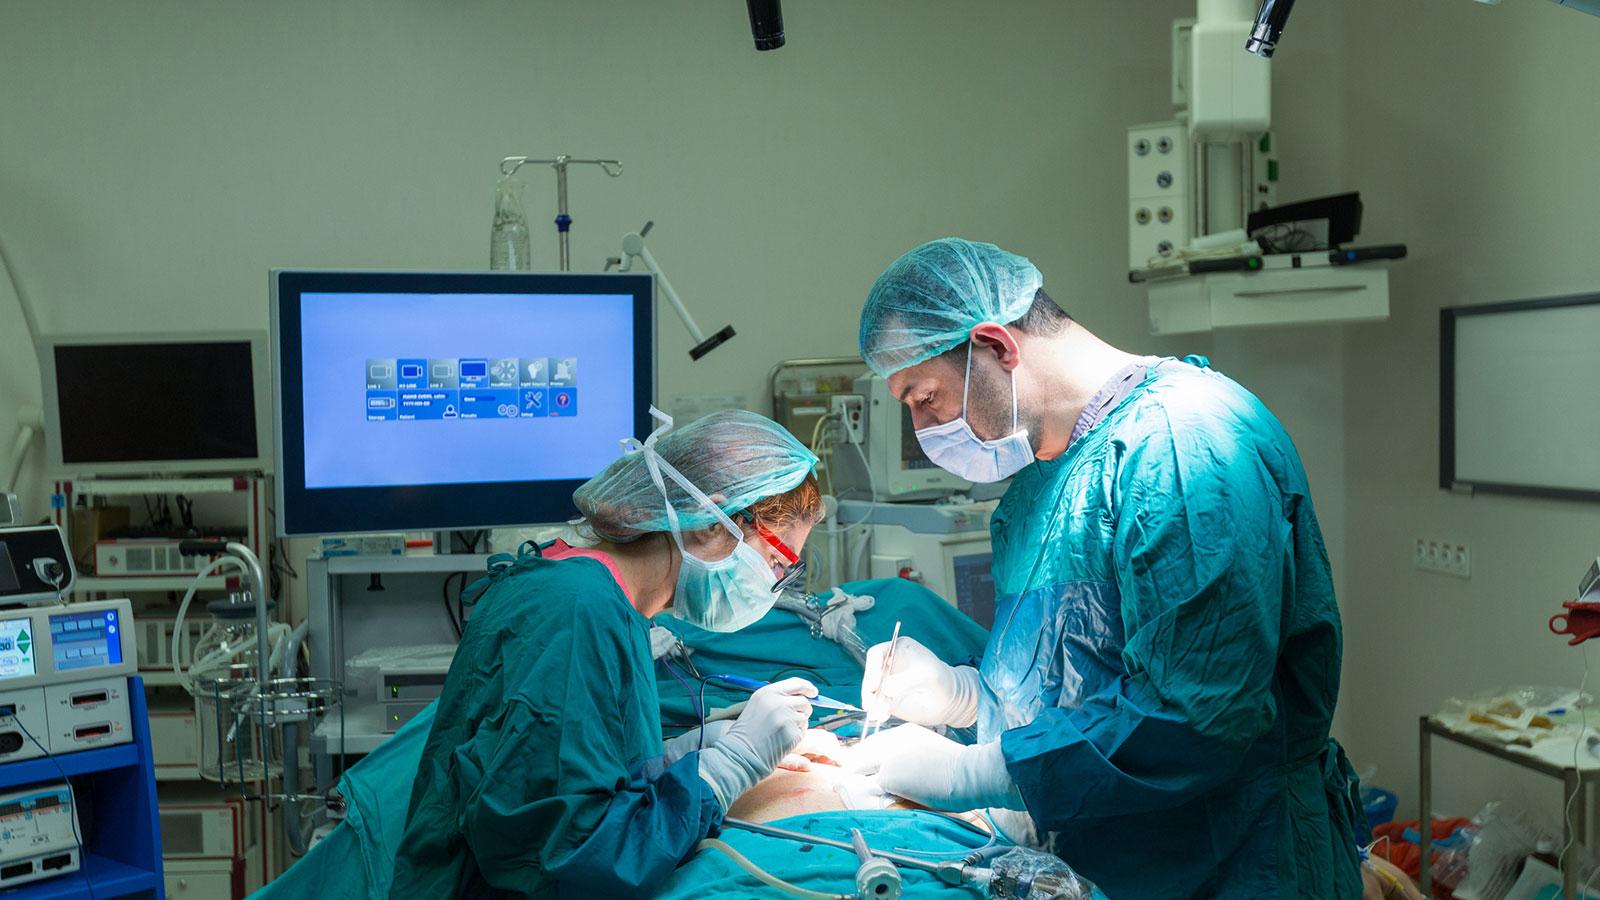 Laparoscopic Surgery In Iran